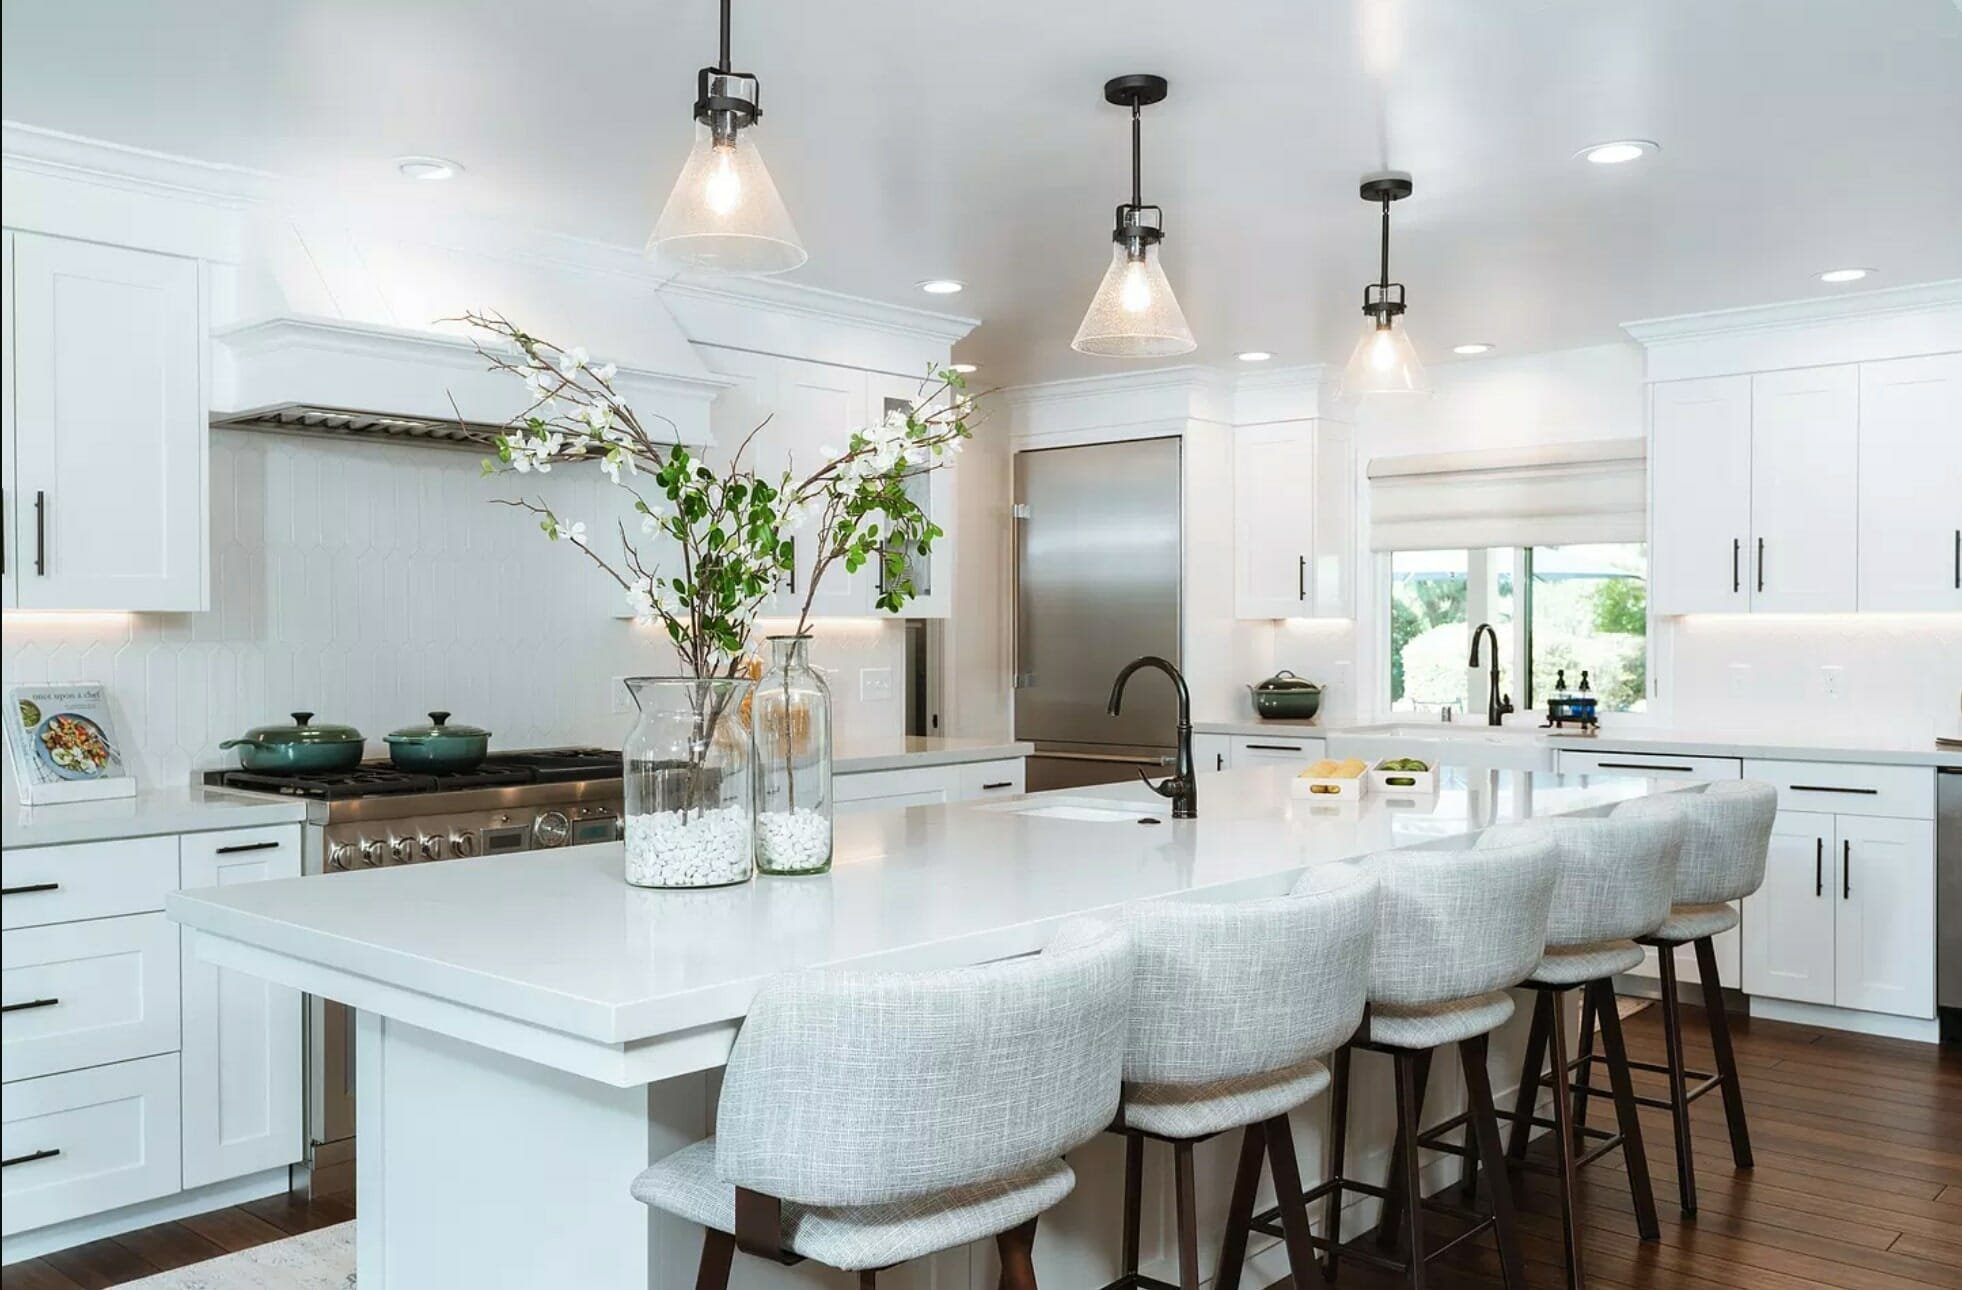 Modern farmhouse kitchen by local interior designers fresno ca